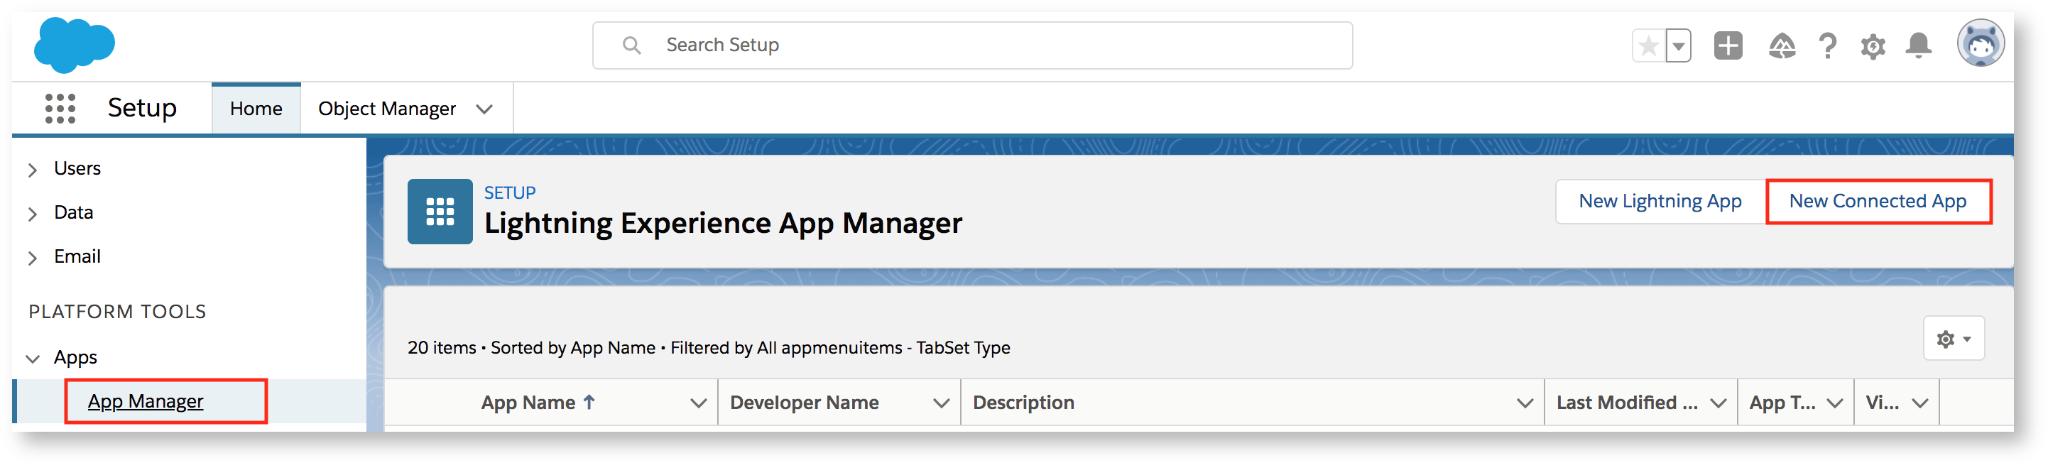 salesforce app manager